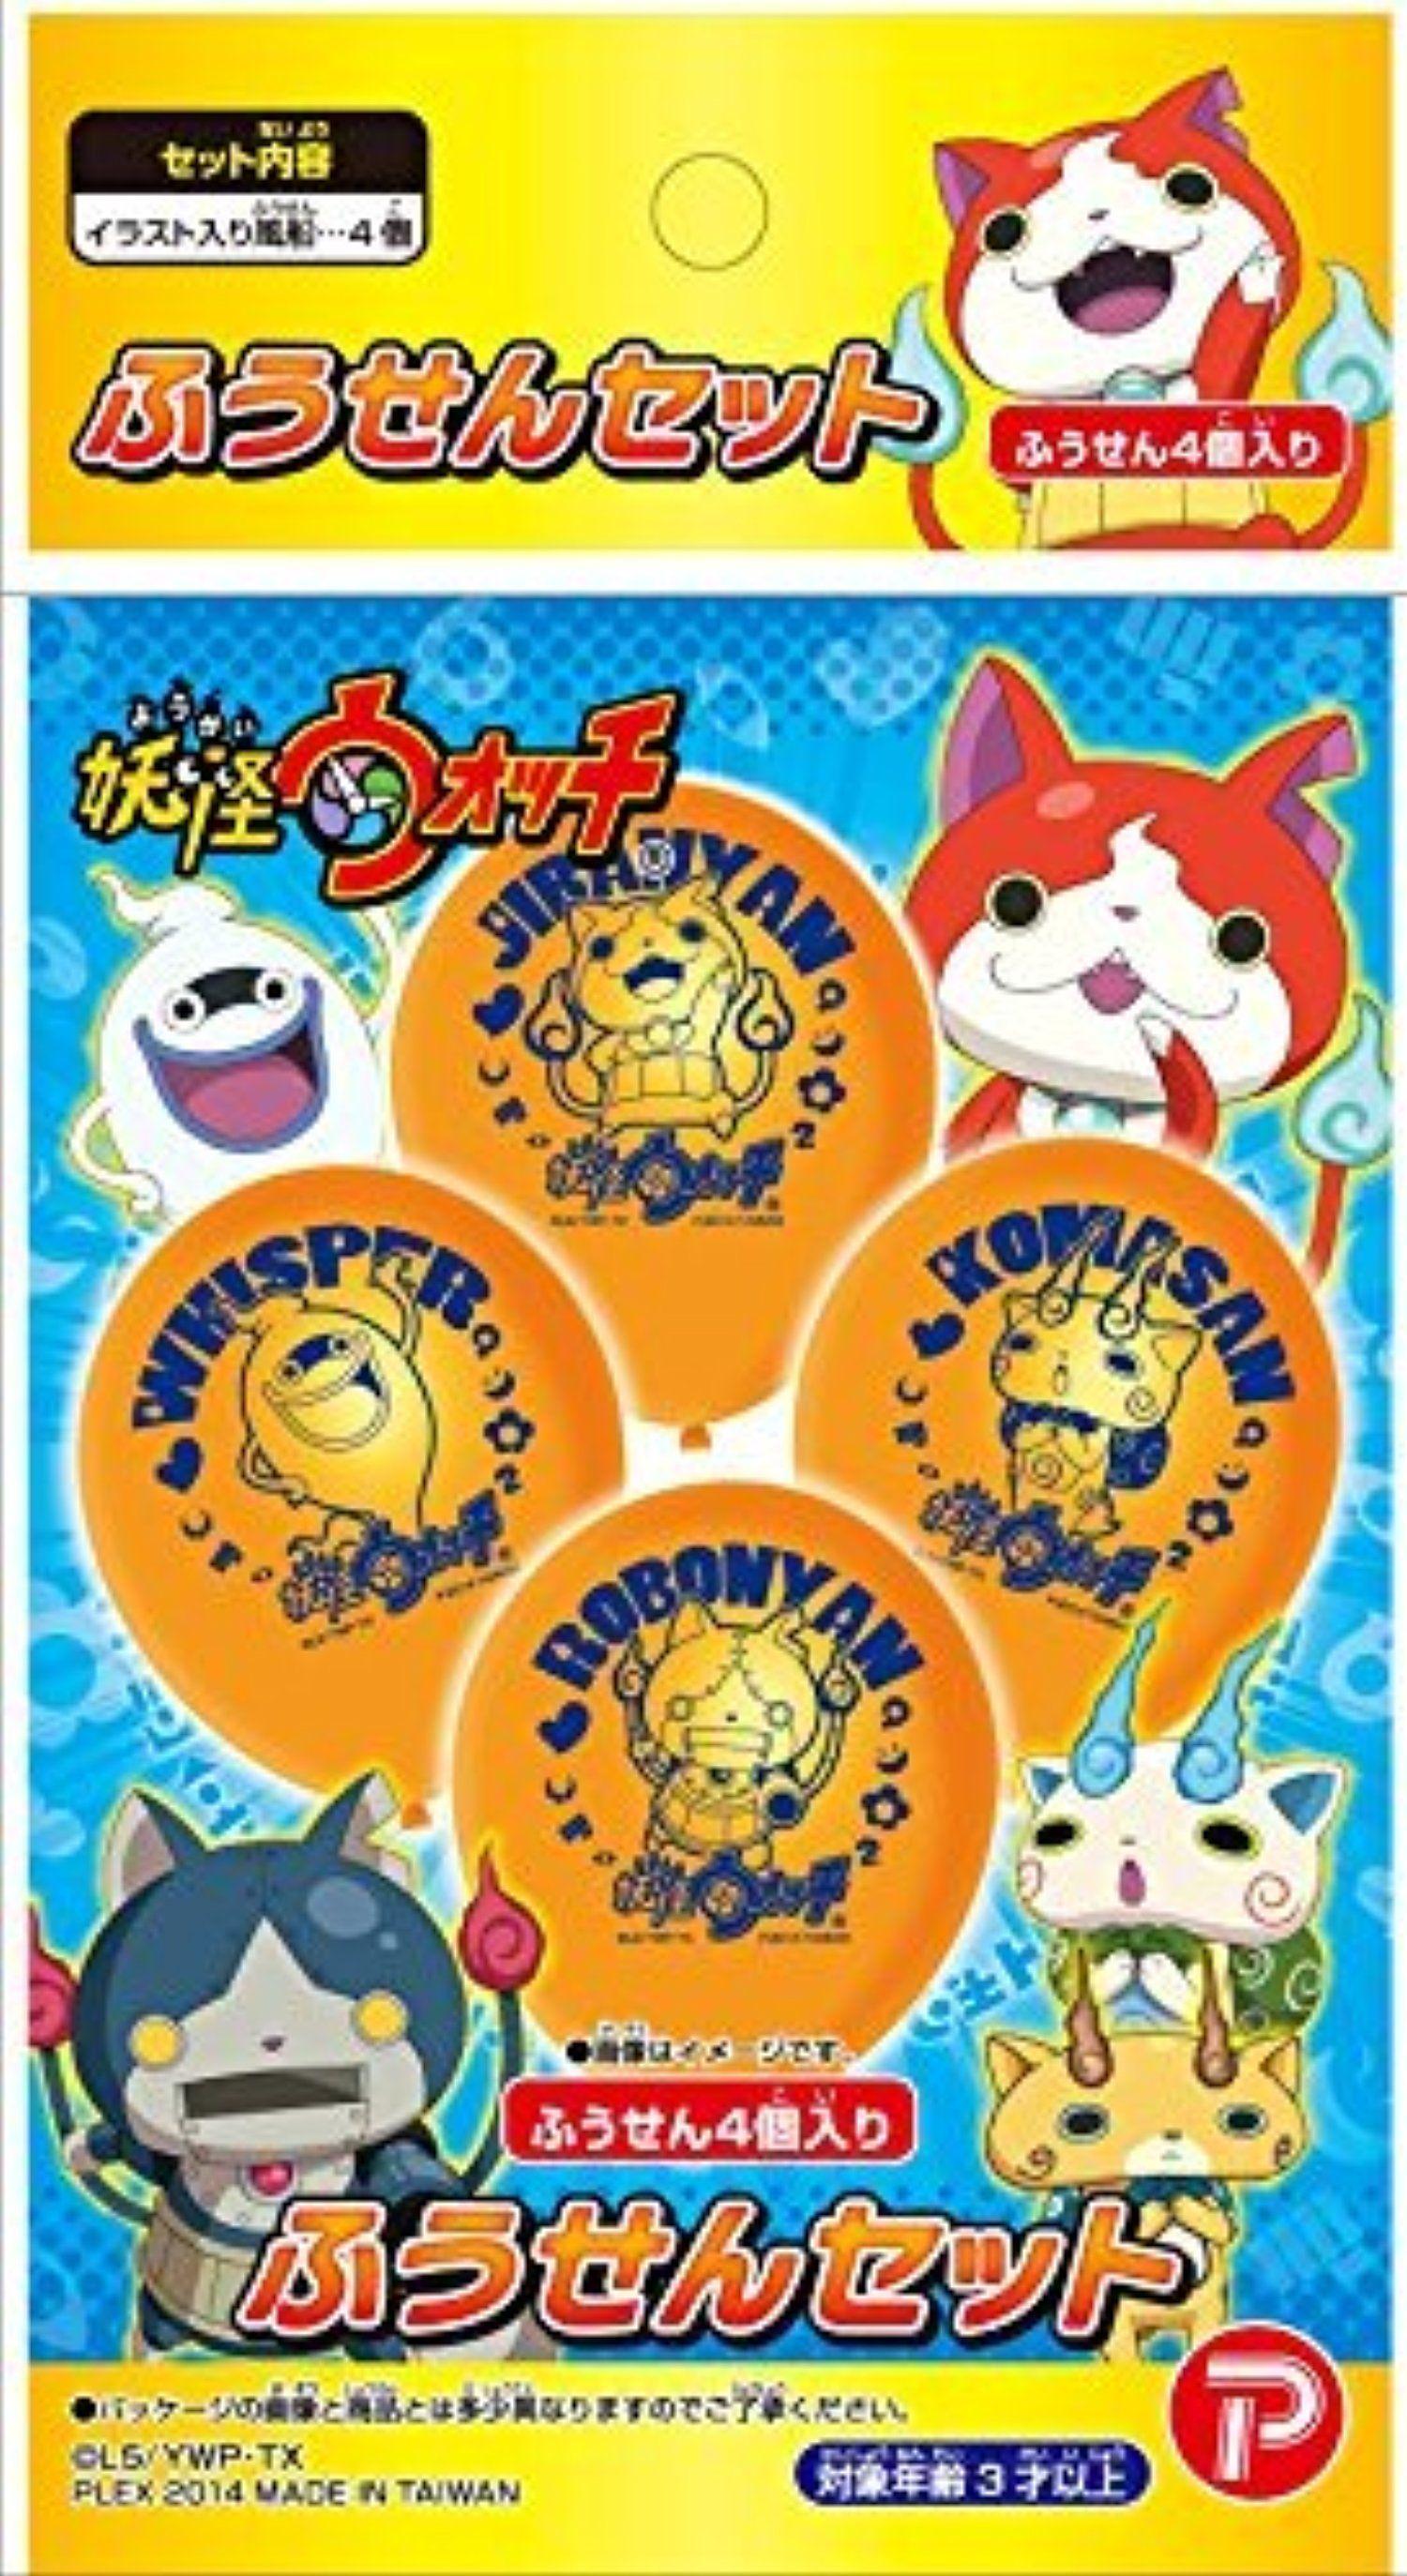 yokai watch party balloons japanese cartoon specter watch by yokai